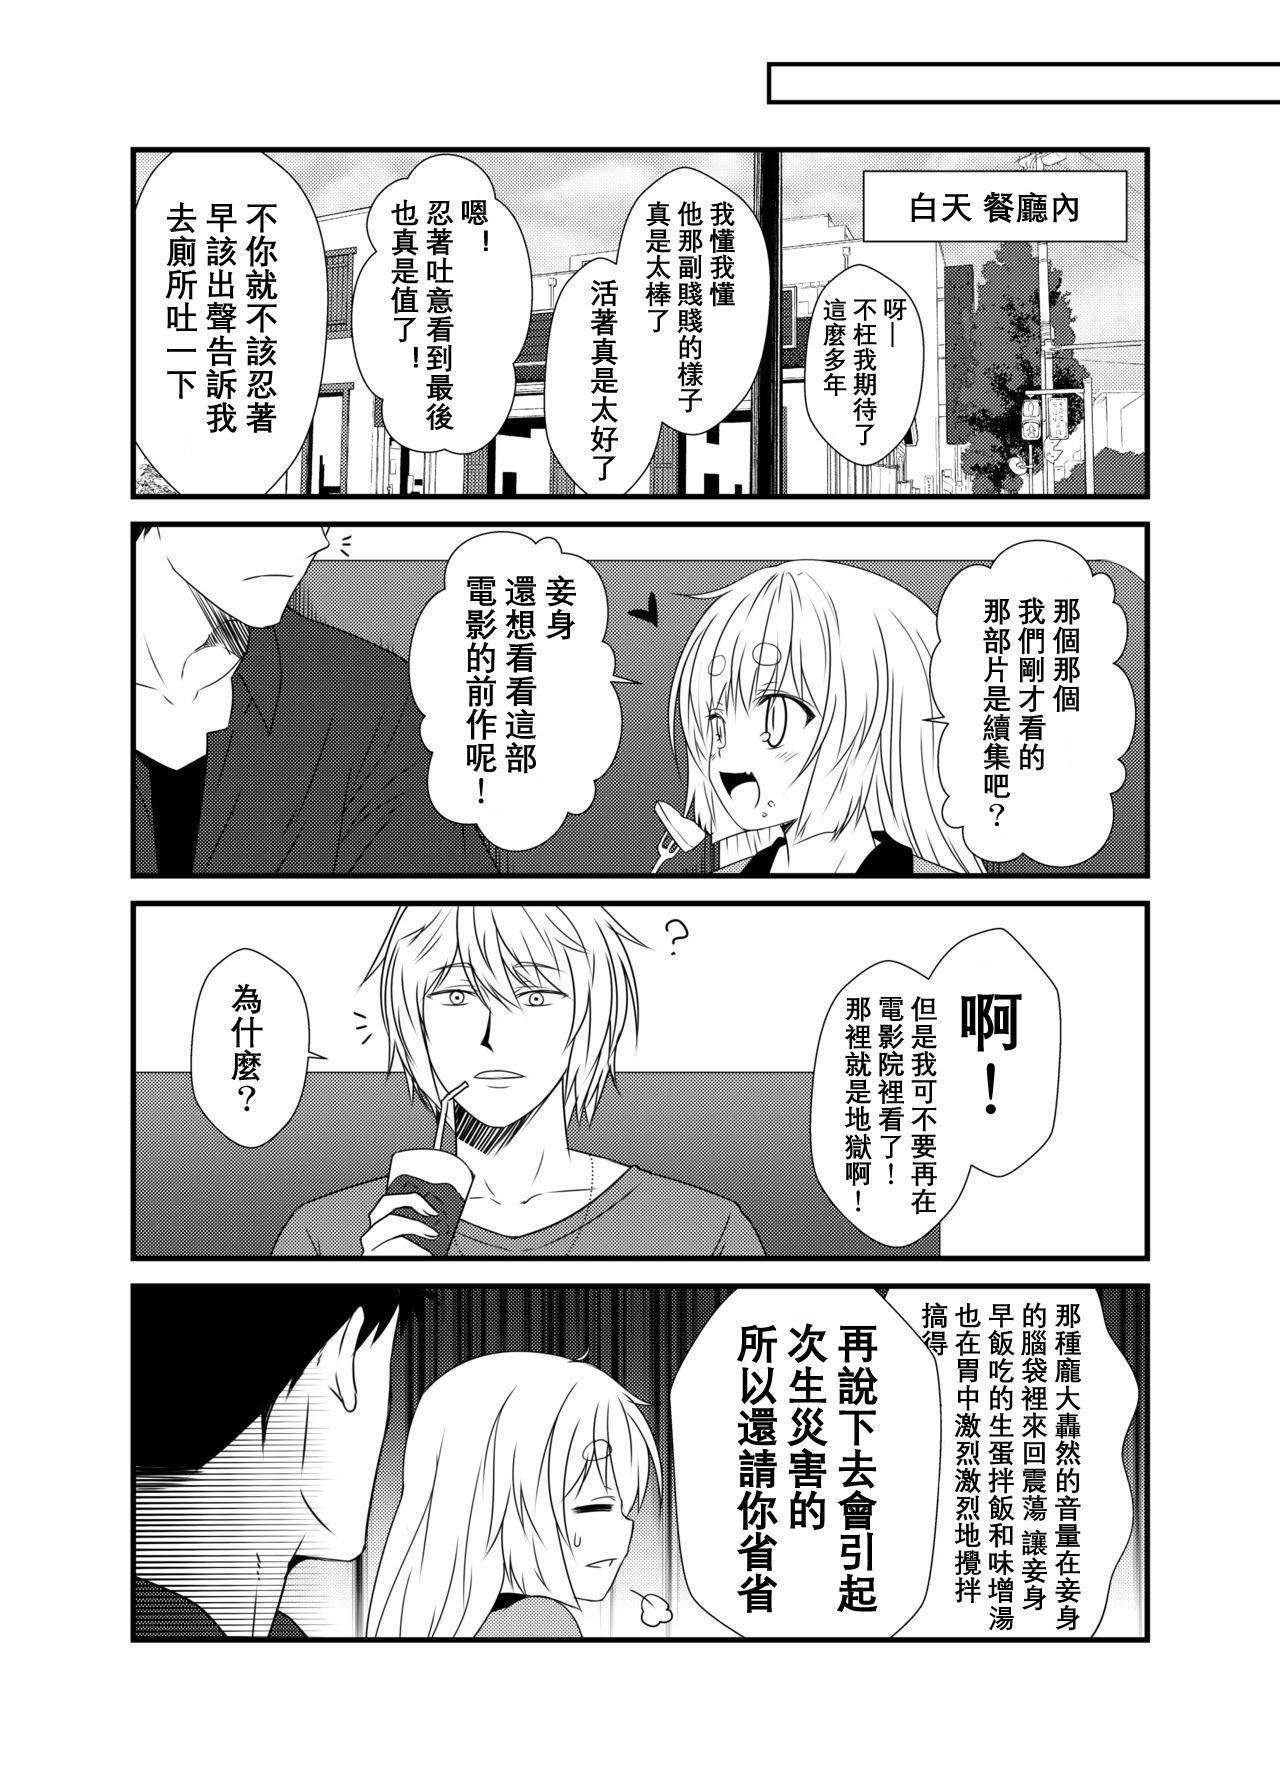 Kohaku Biyori Vol. 5 11